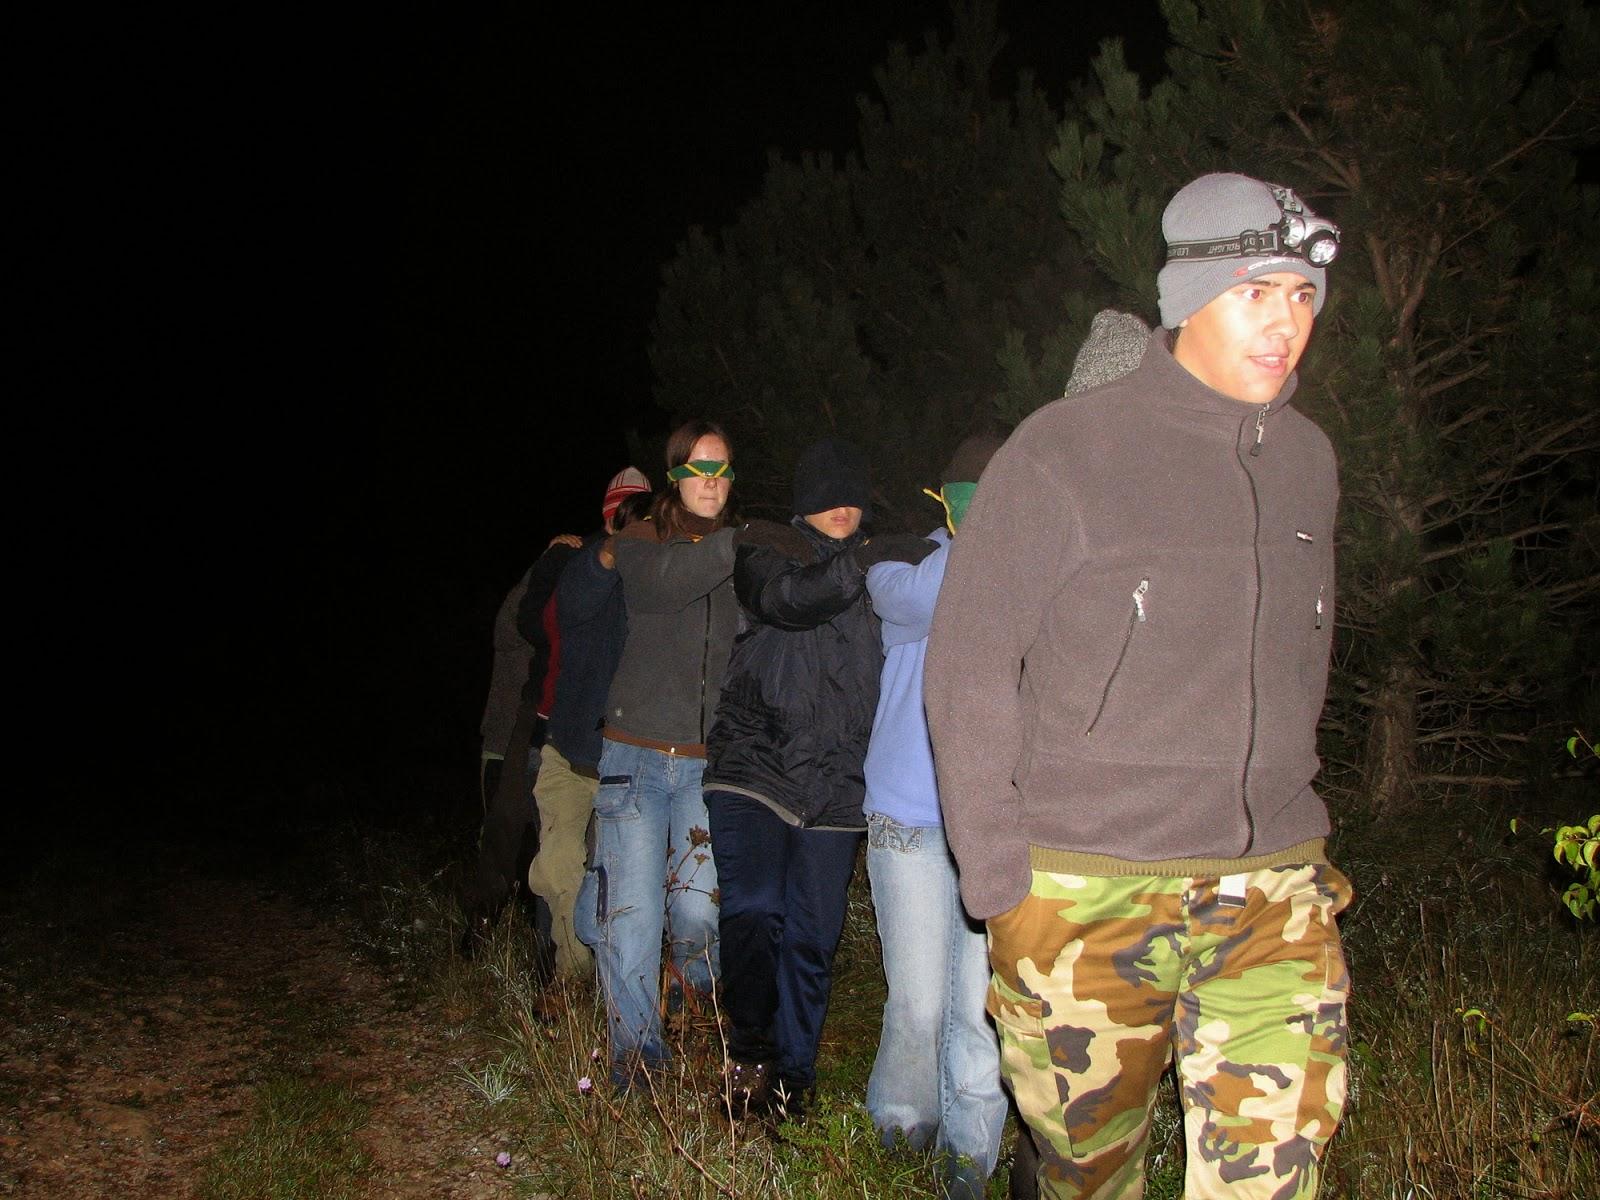 Prehod PP, Ilirska Bistrica 2005 - picture%2B062.jpg